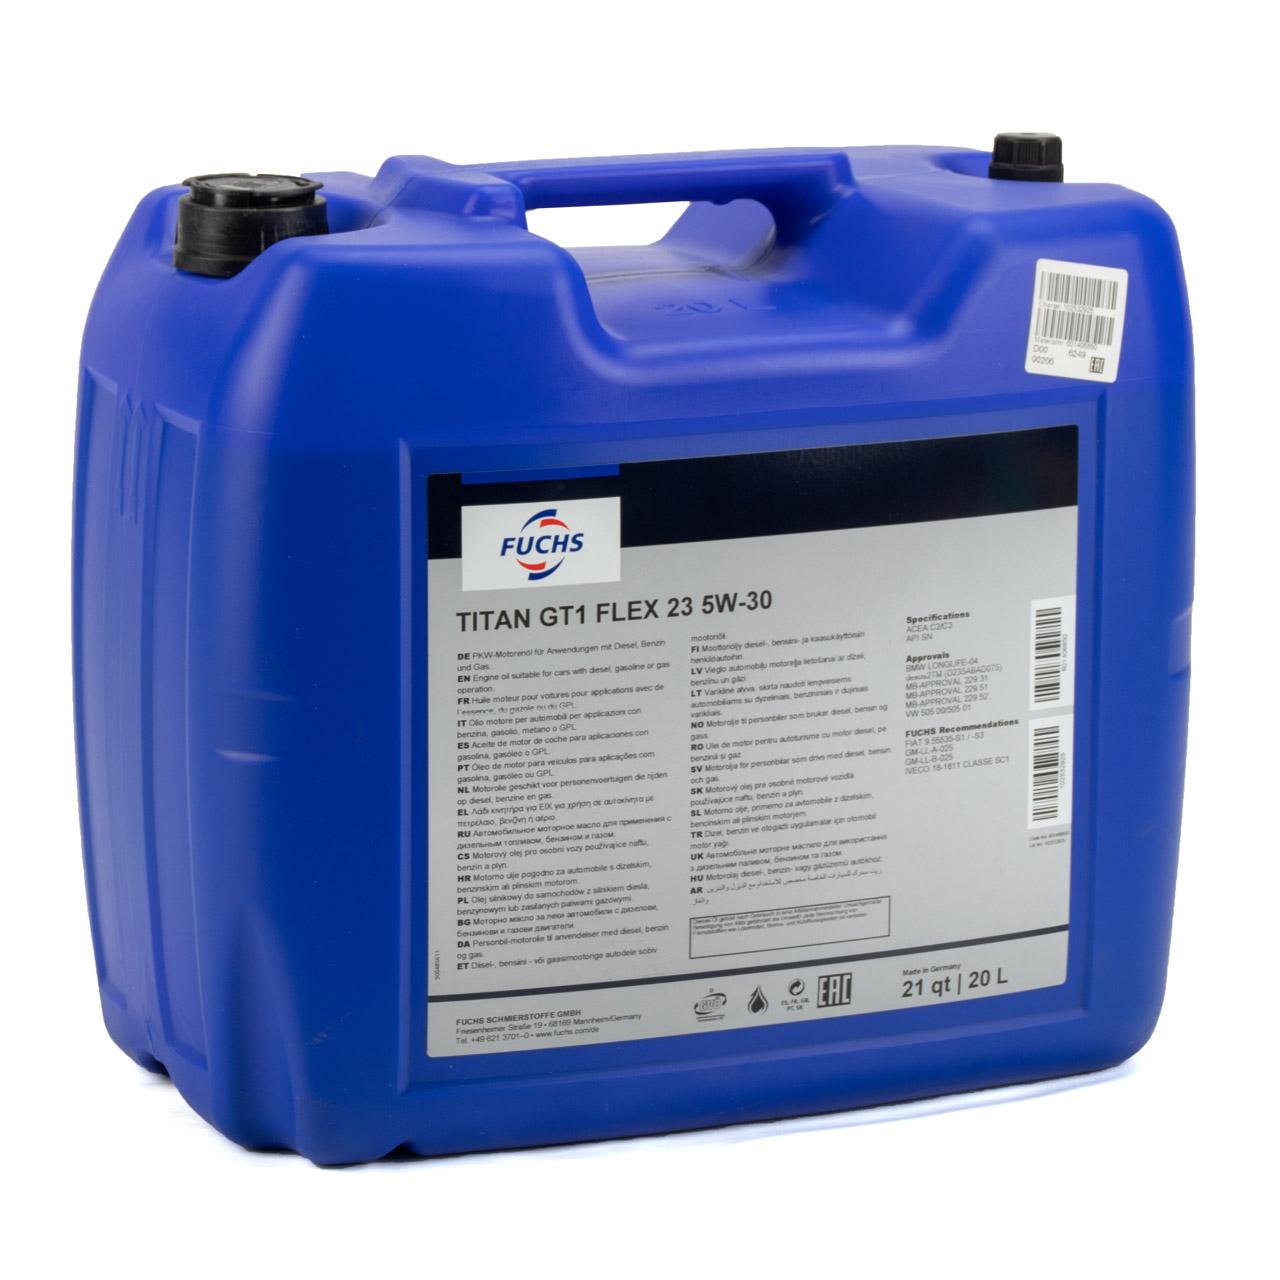 FUCHS Motoröl TITAN GT1 Flex 23 5W30 5W-30 dexos2 LL-04 505.00/505.01 - 20 Liter